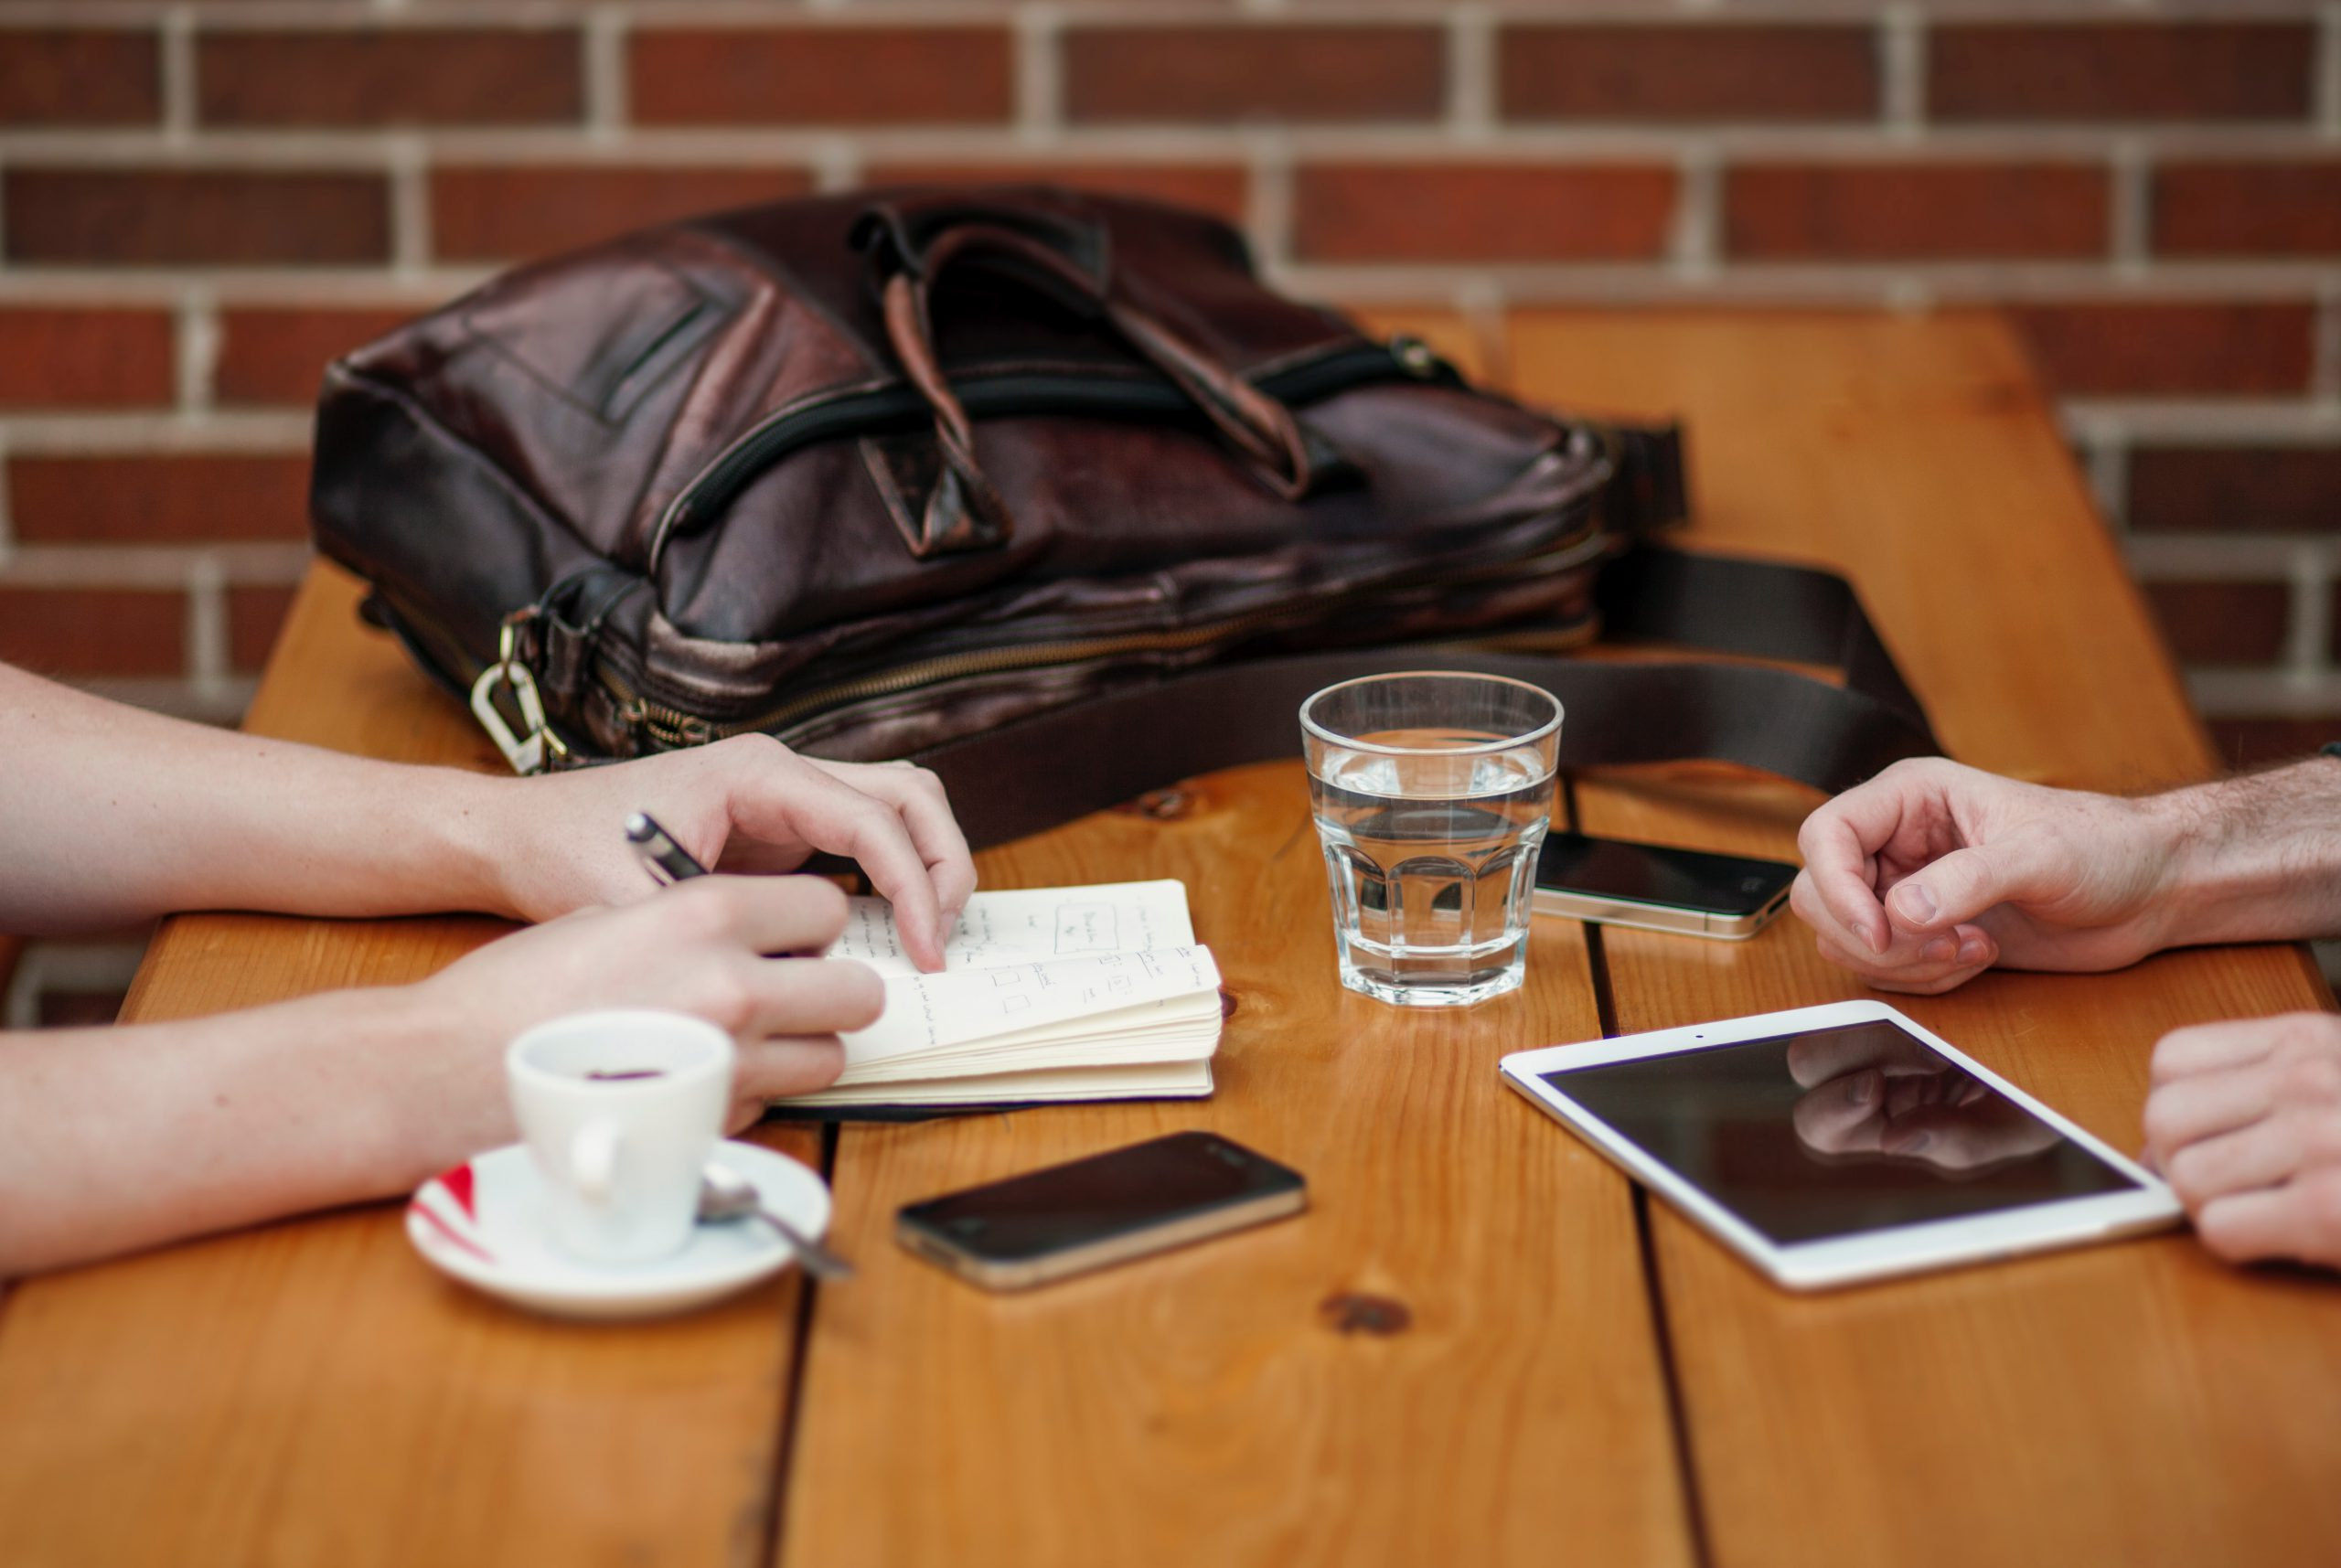 établir un plan de communication